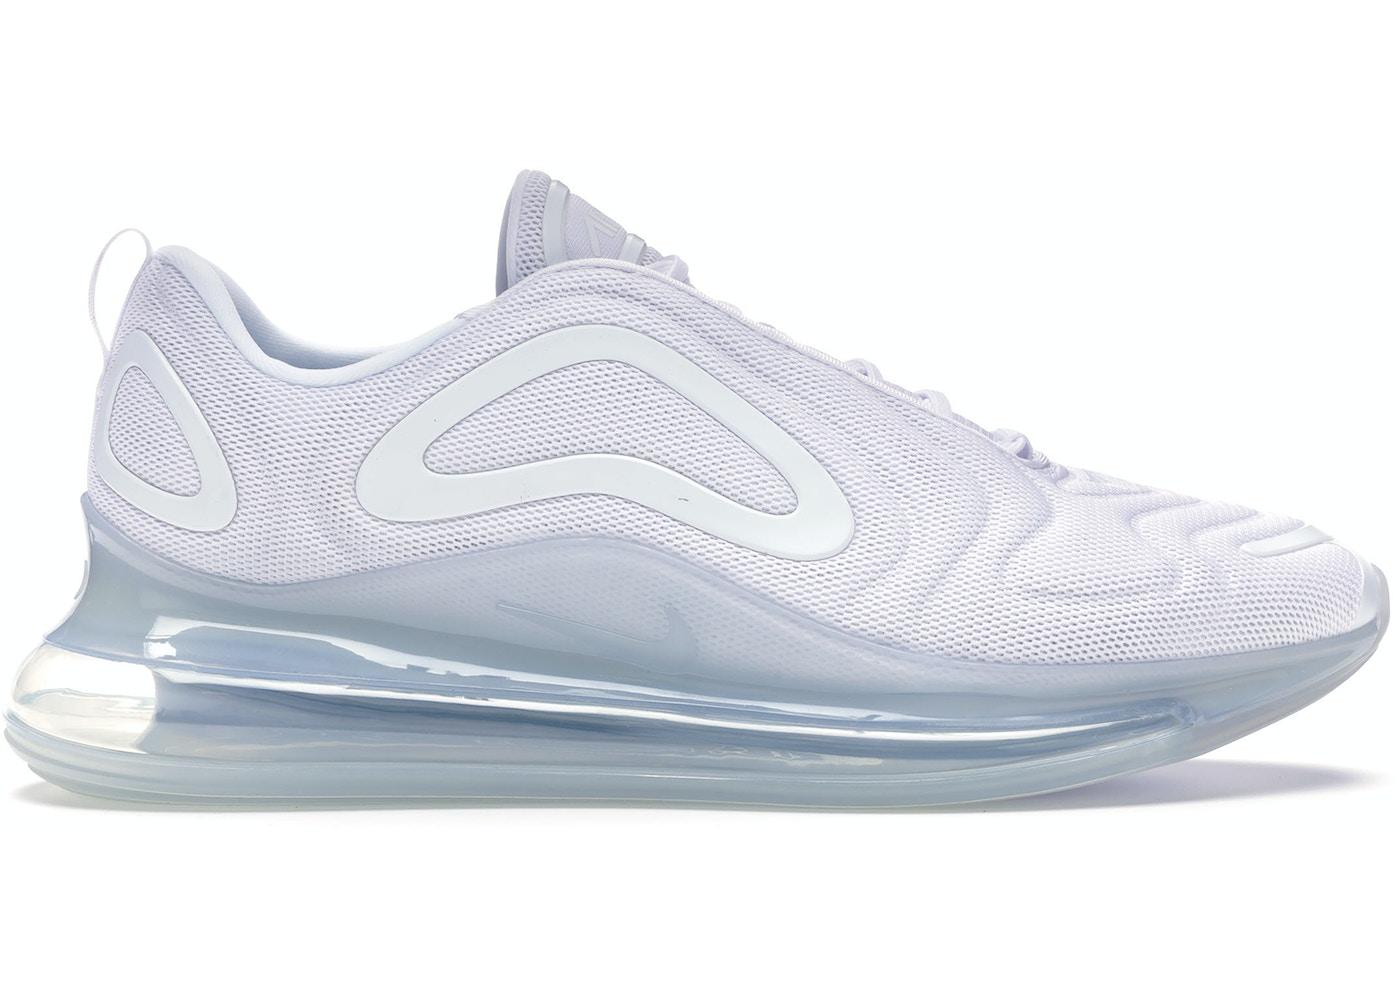 Nike Air Max 720 Pure Platinum Ao2924 100